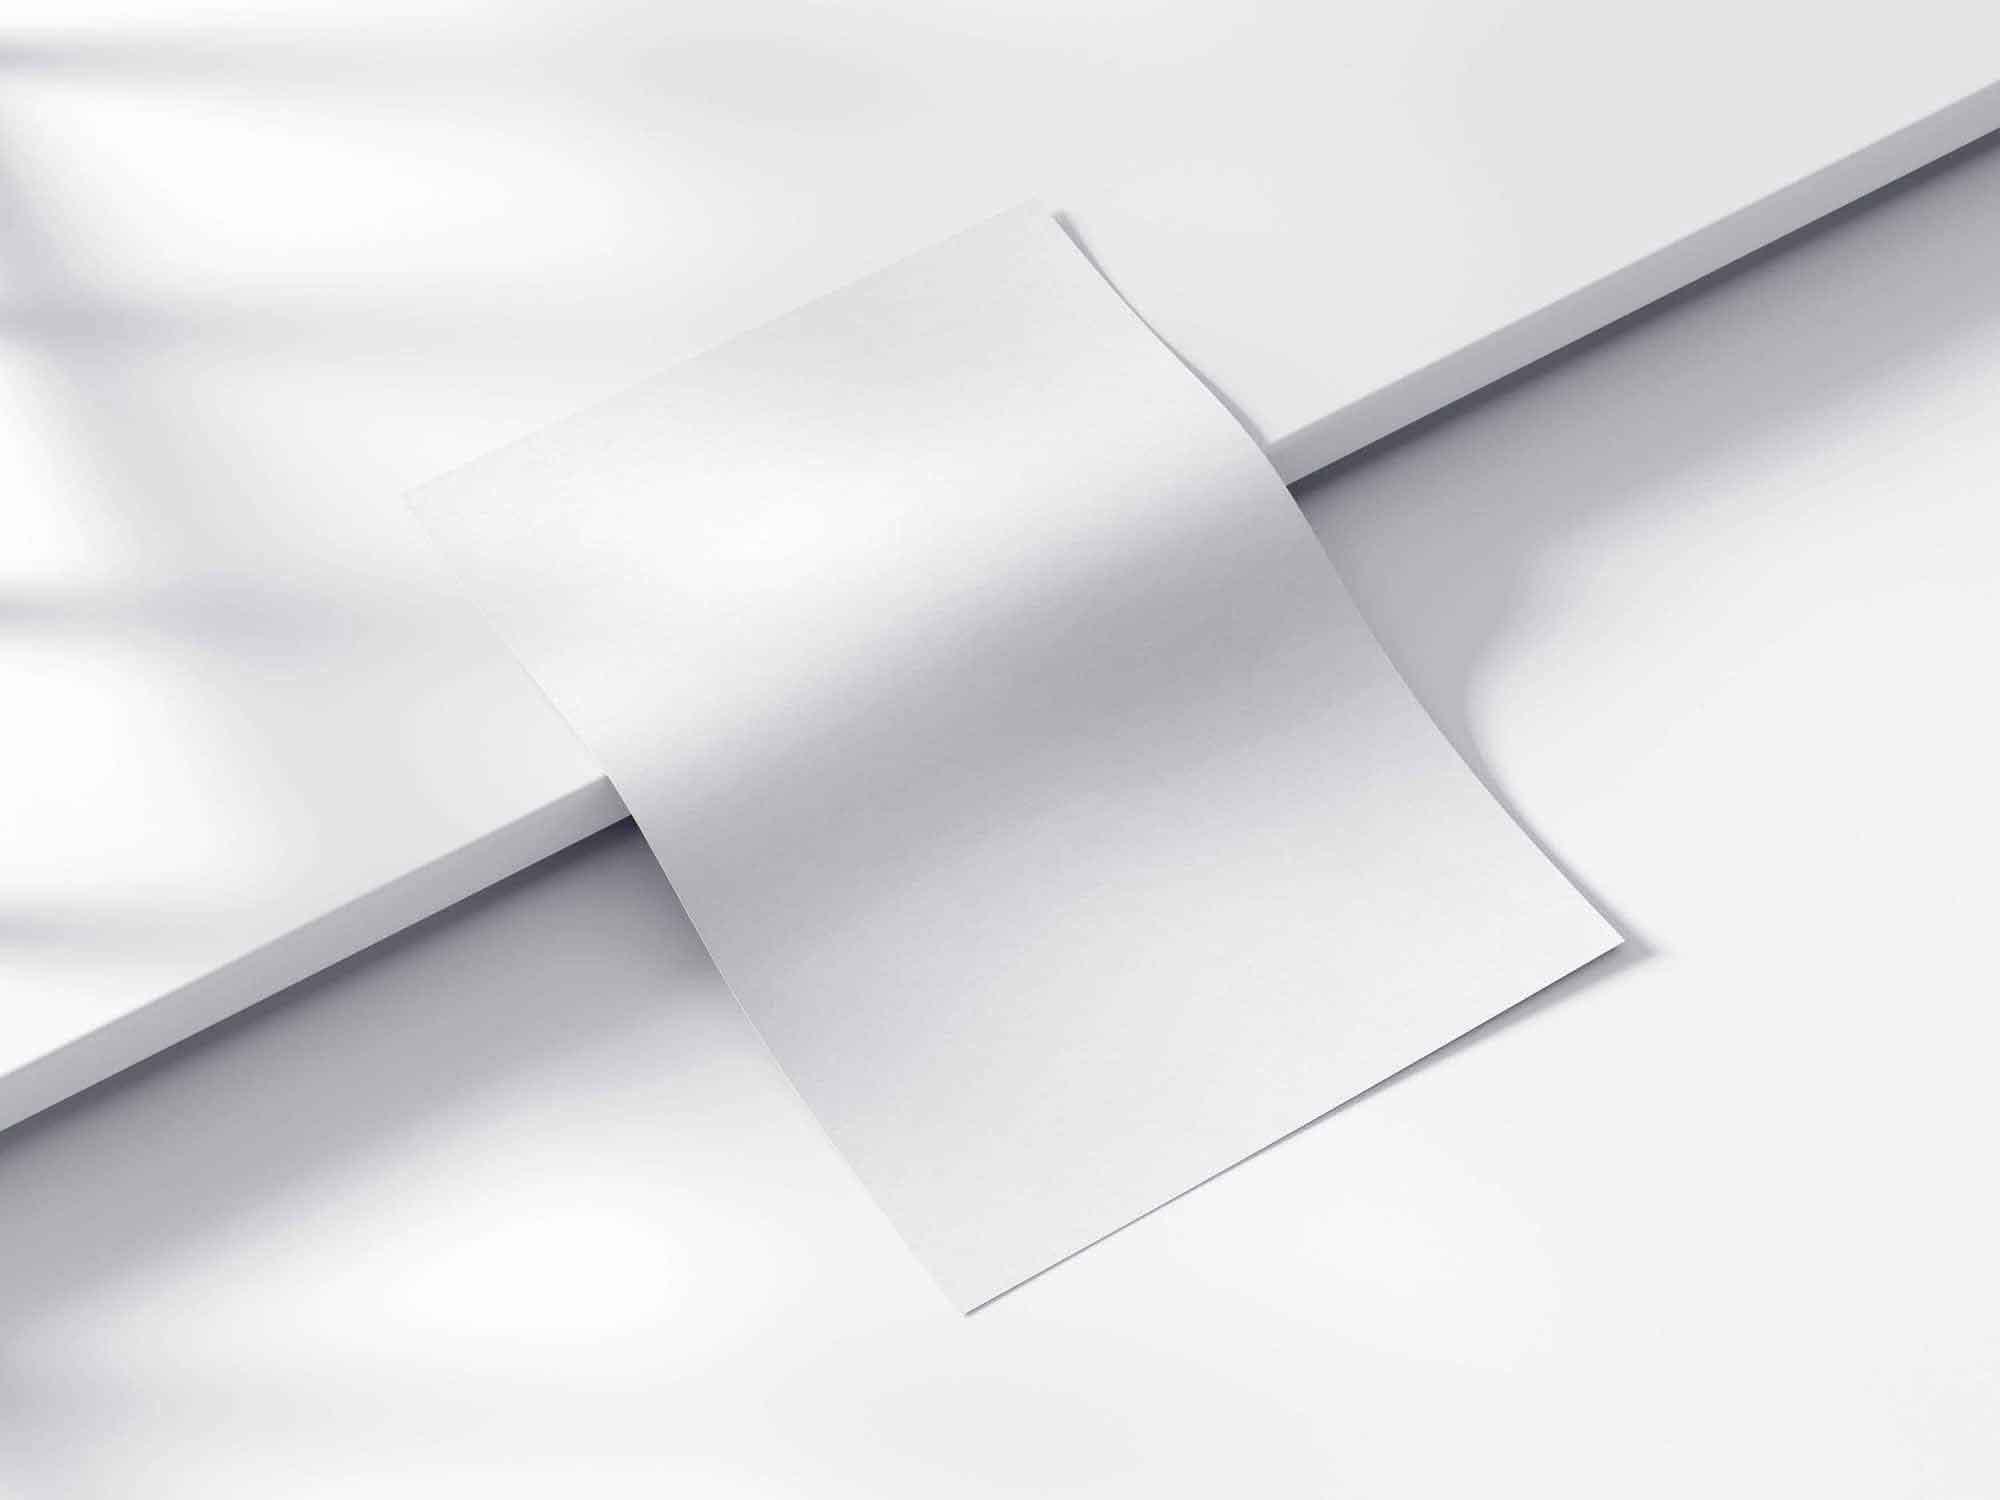 3D Curved Paper Mockup 3